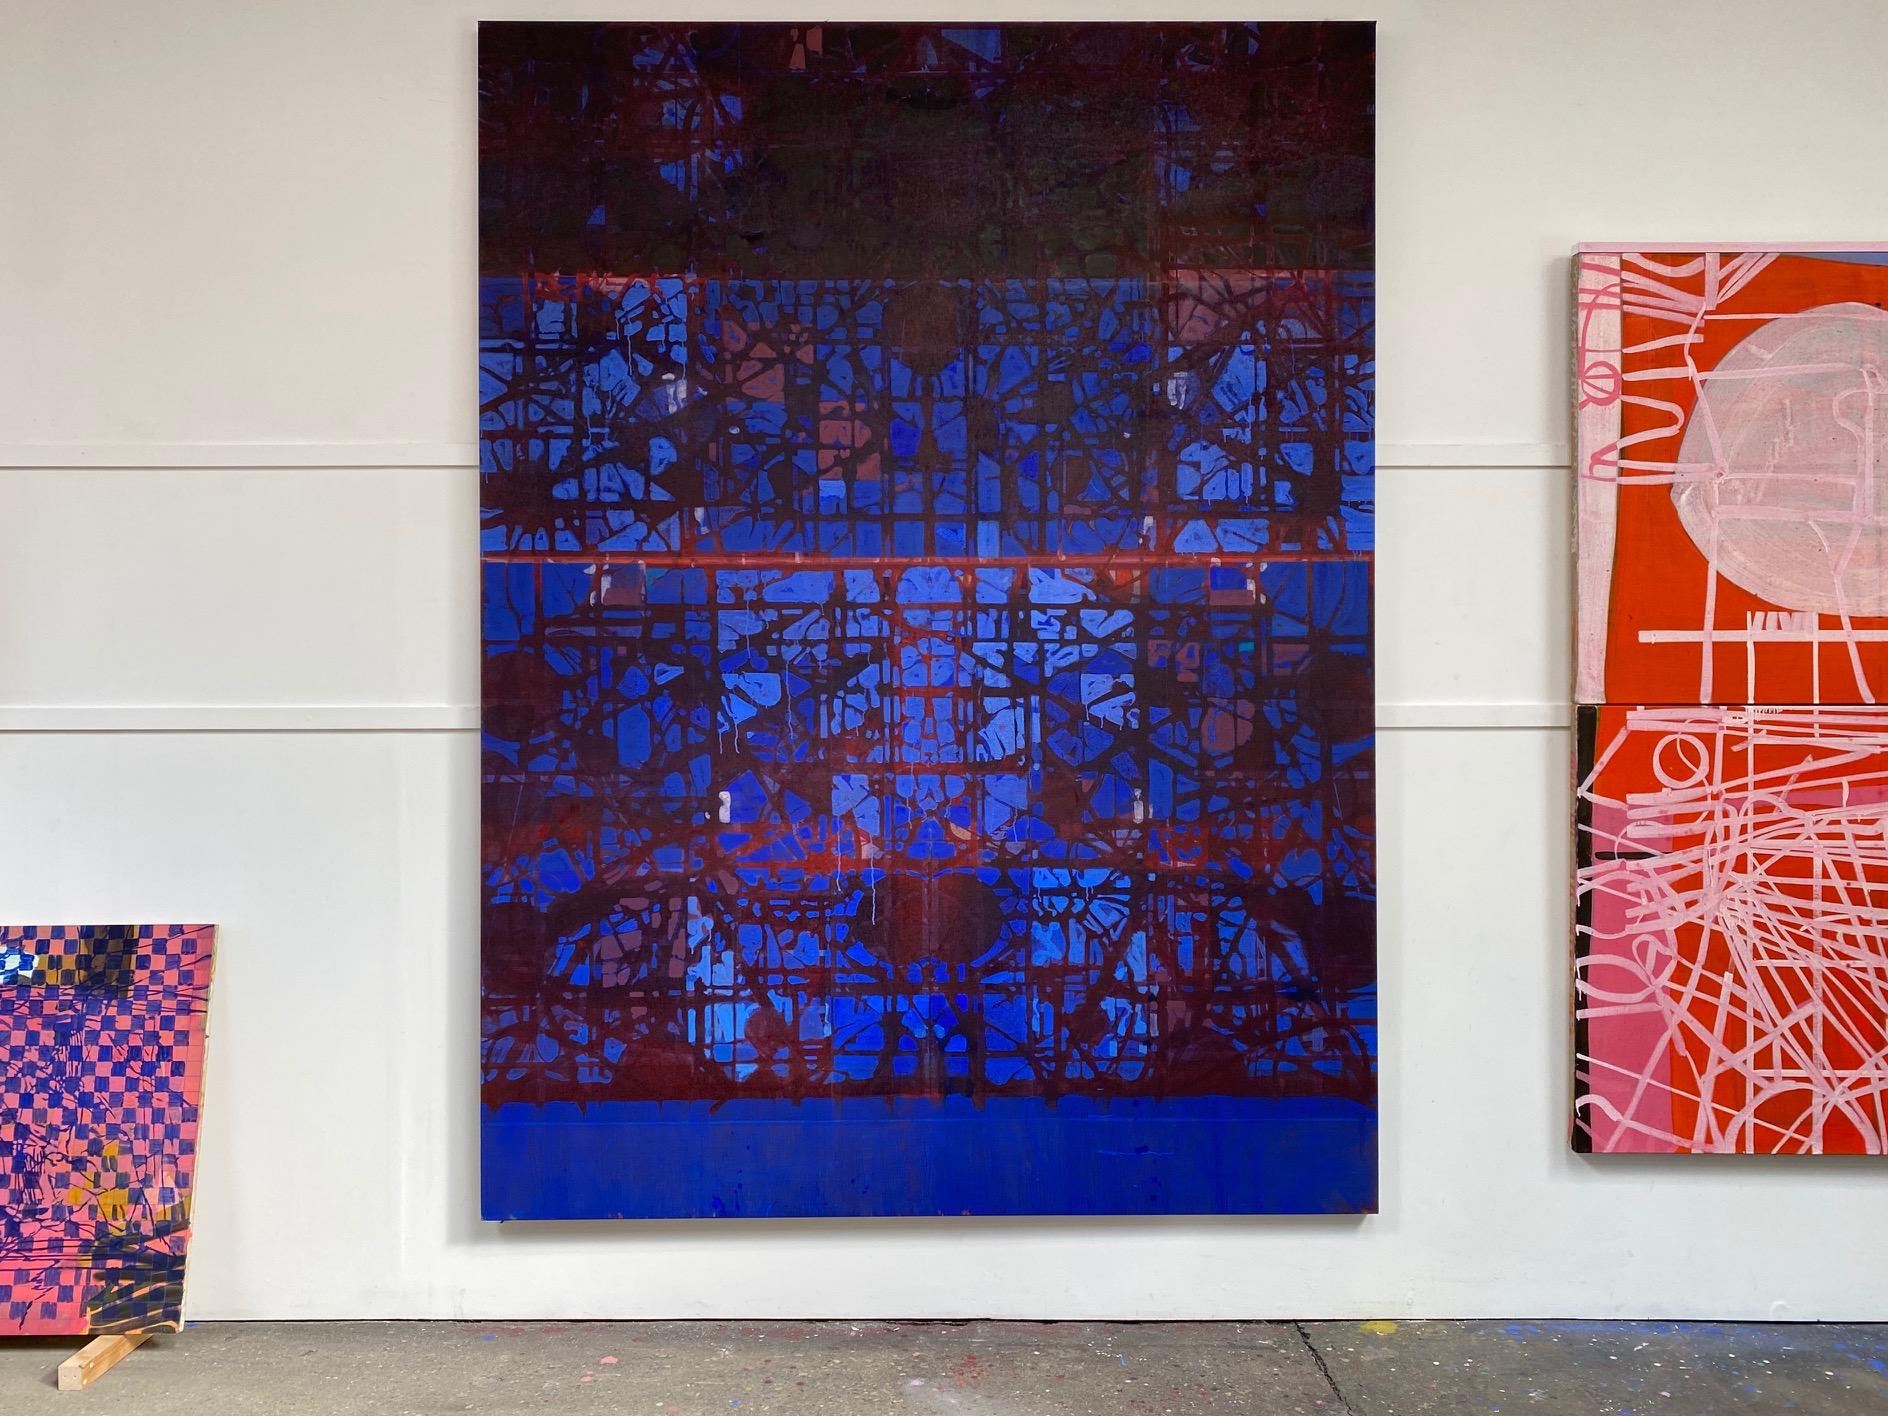 Gate III, 2020 Matthew Burrows Huile sur panneau, 240 x 180 cm